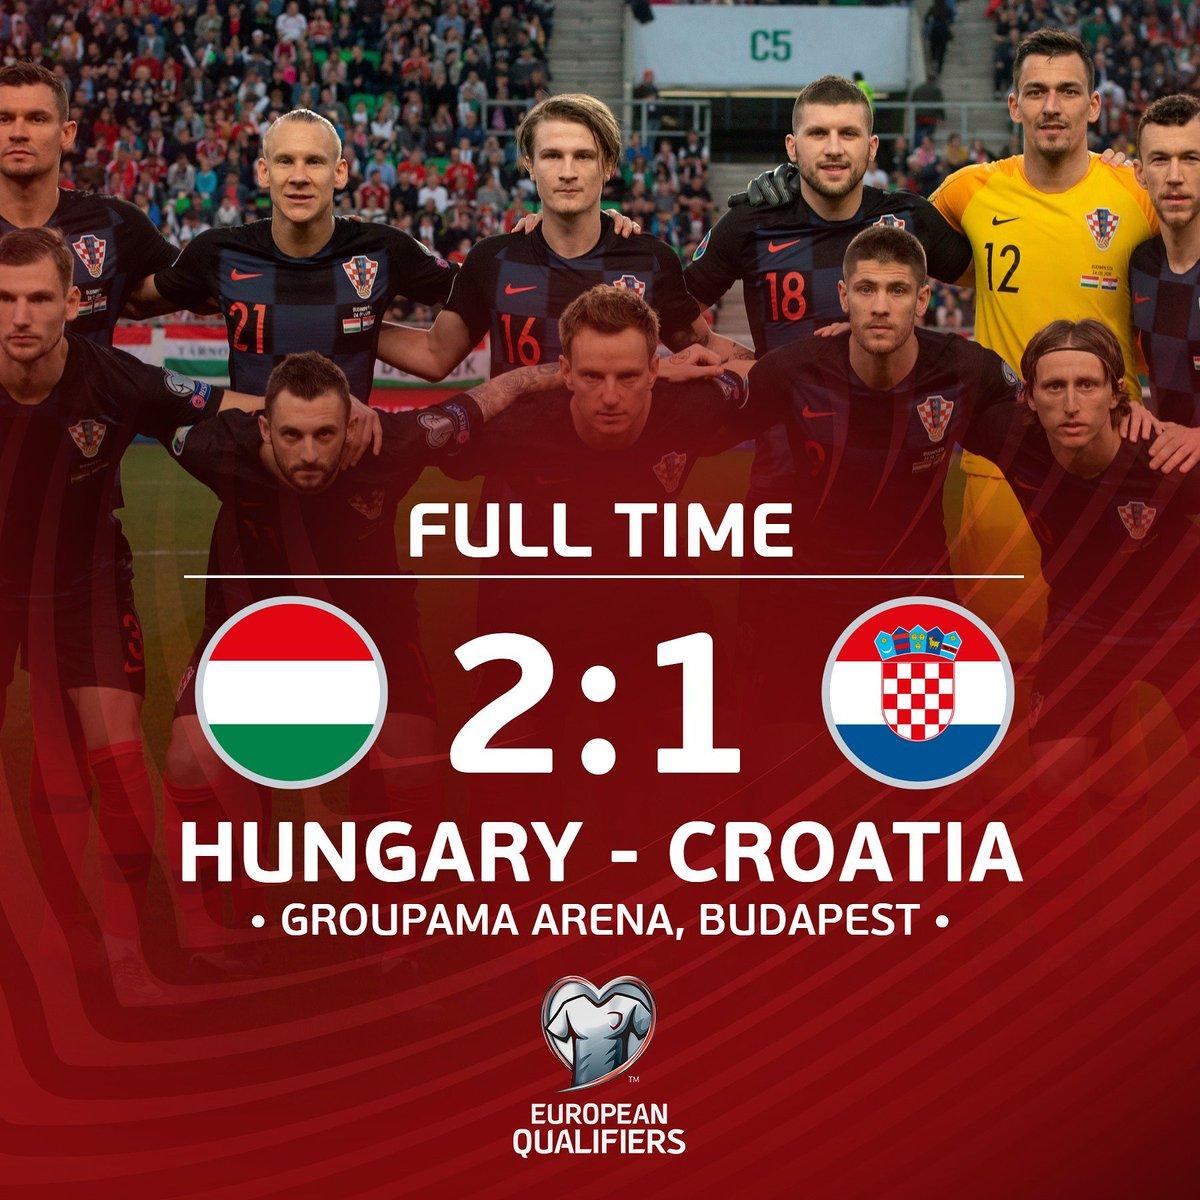 Deportes Total's photo on Hungría